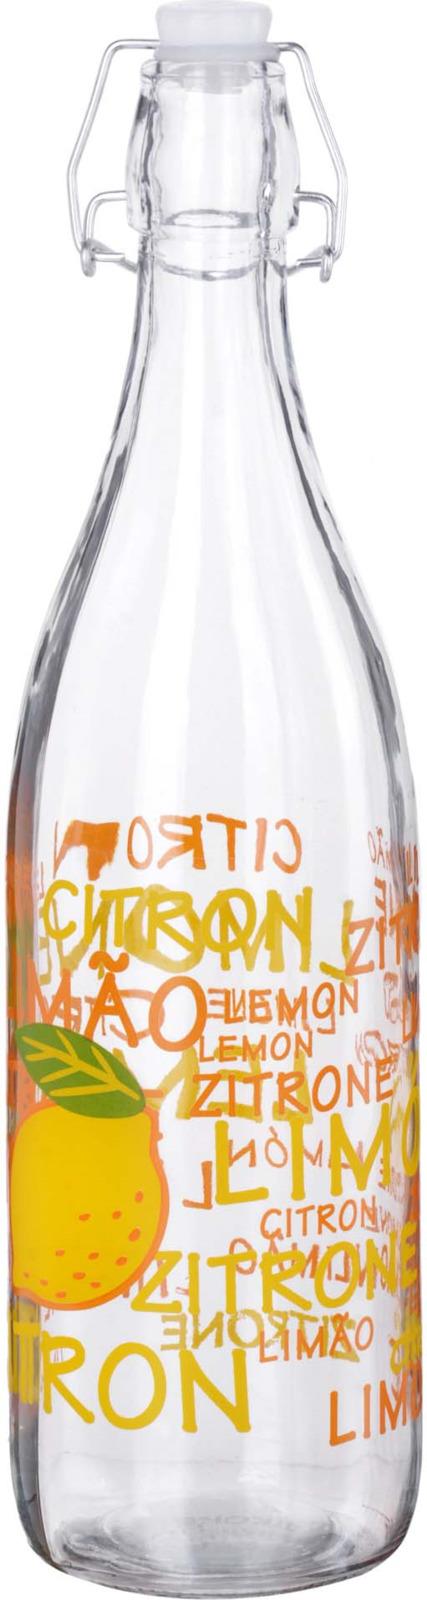 Бутылка Mayer & Boch Лимон, цвет: желтый, оранжевый, зеленый, 1 л